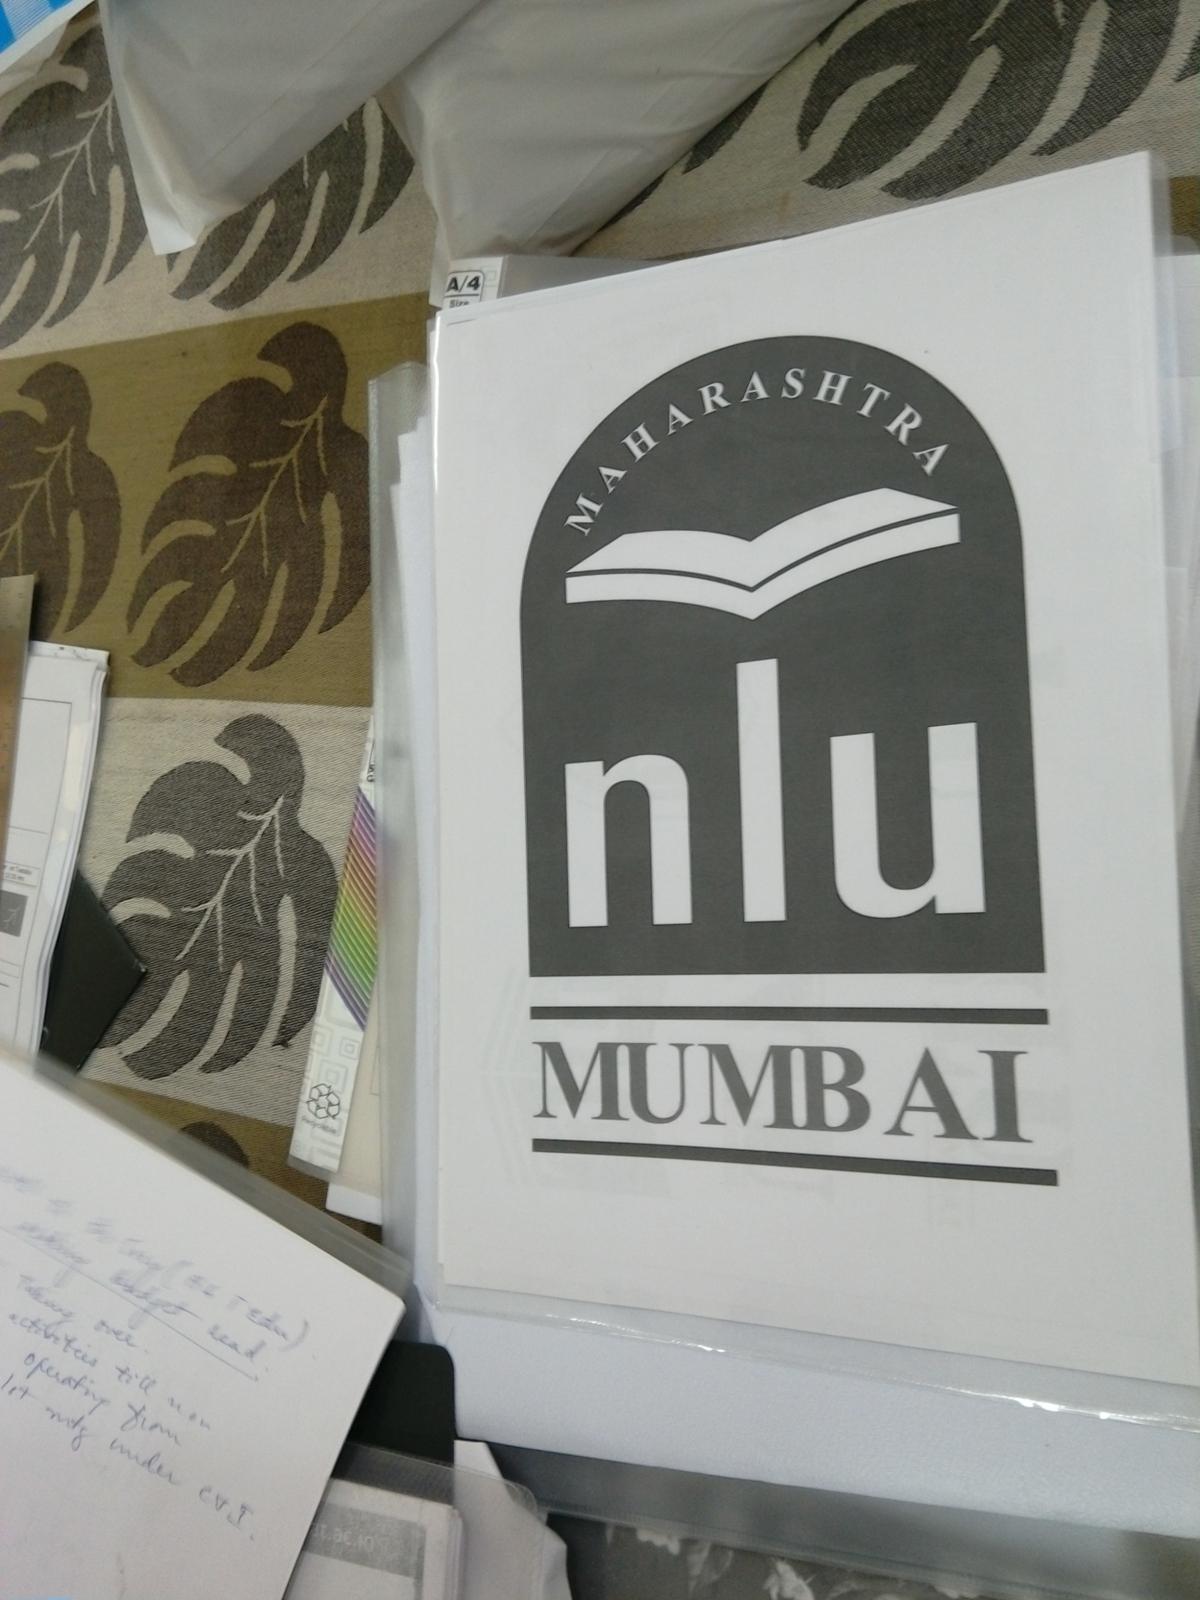 NLU Mumbai gets (temporary) campus, two-storey building, separate entrance examination – Vice Chancellor Dr. BP Panda